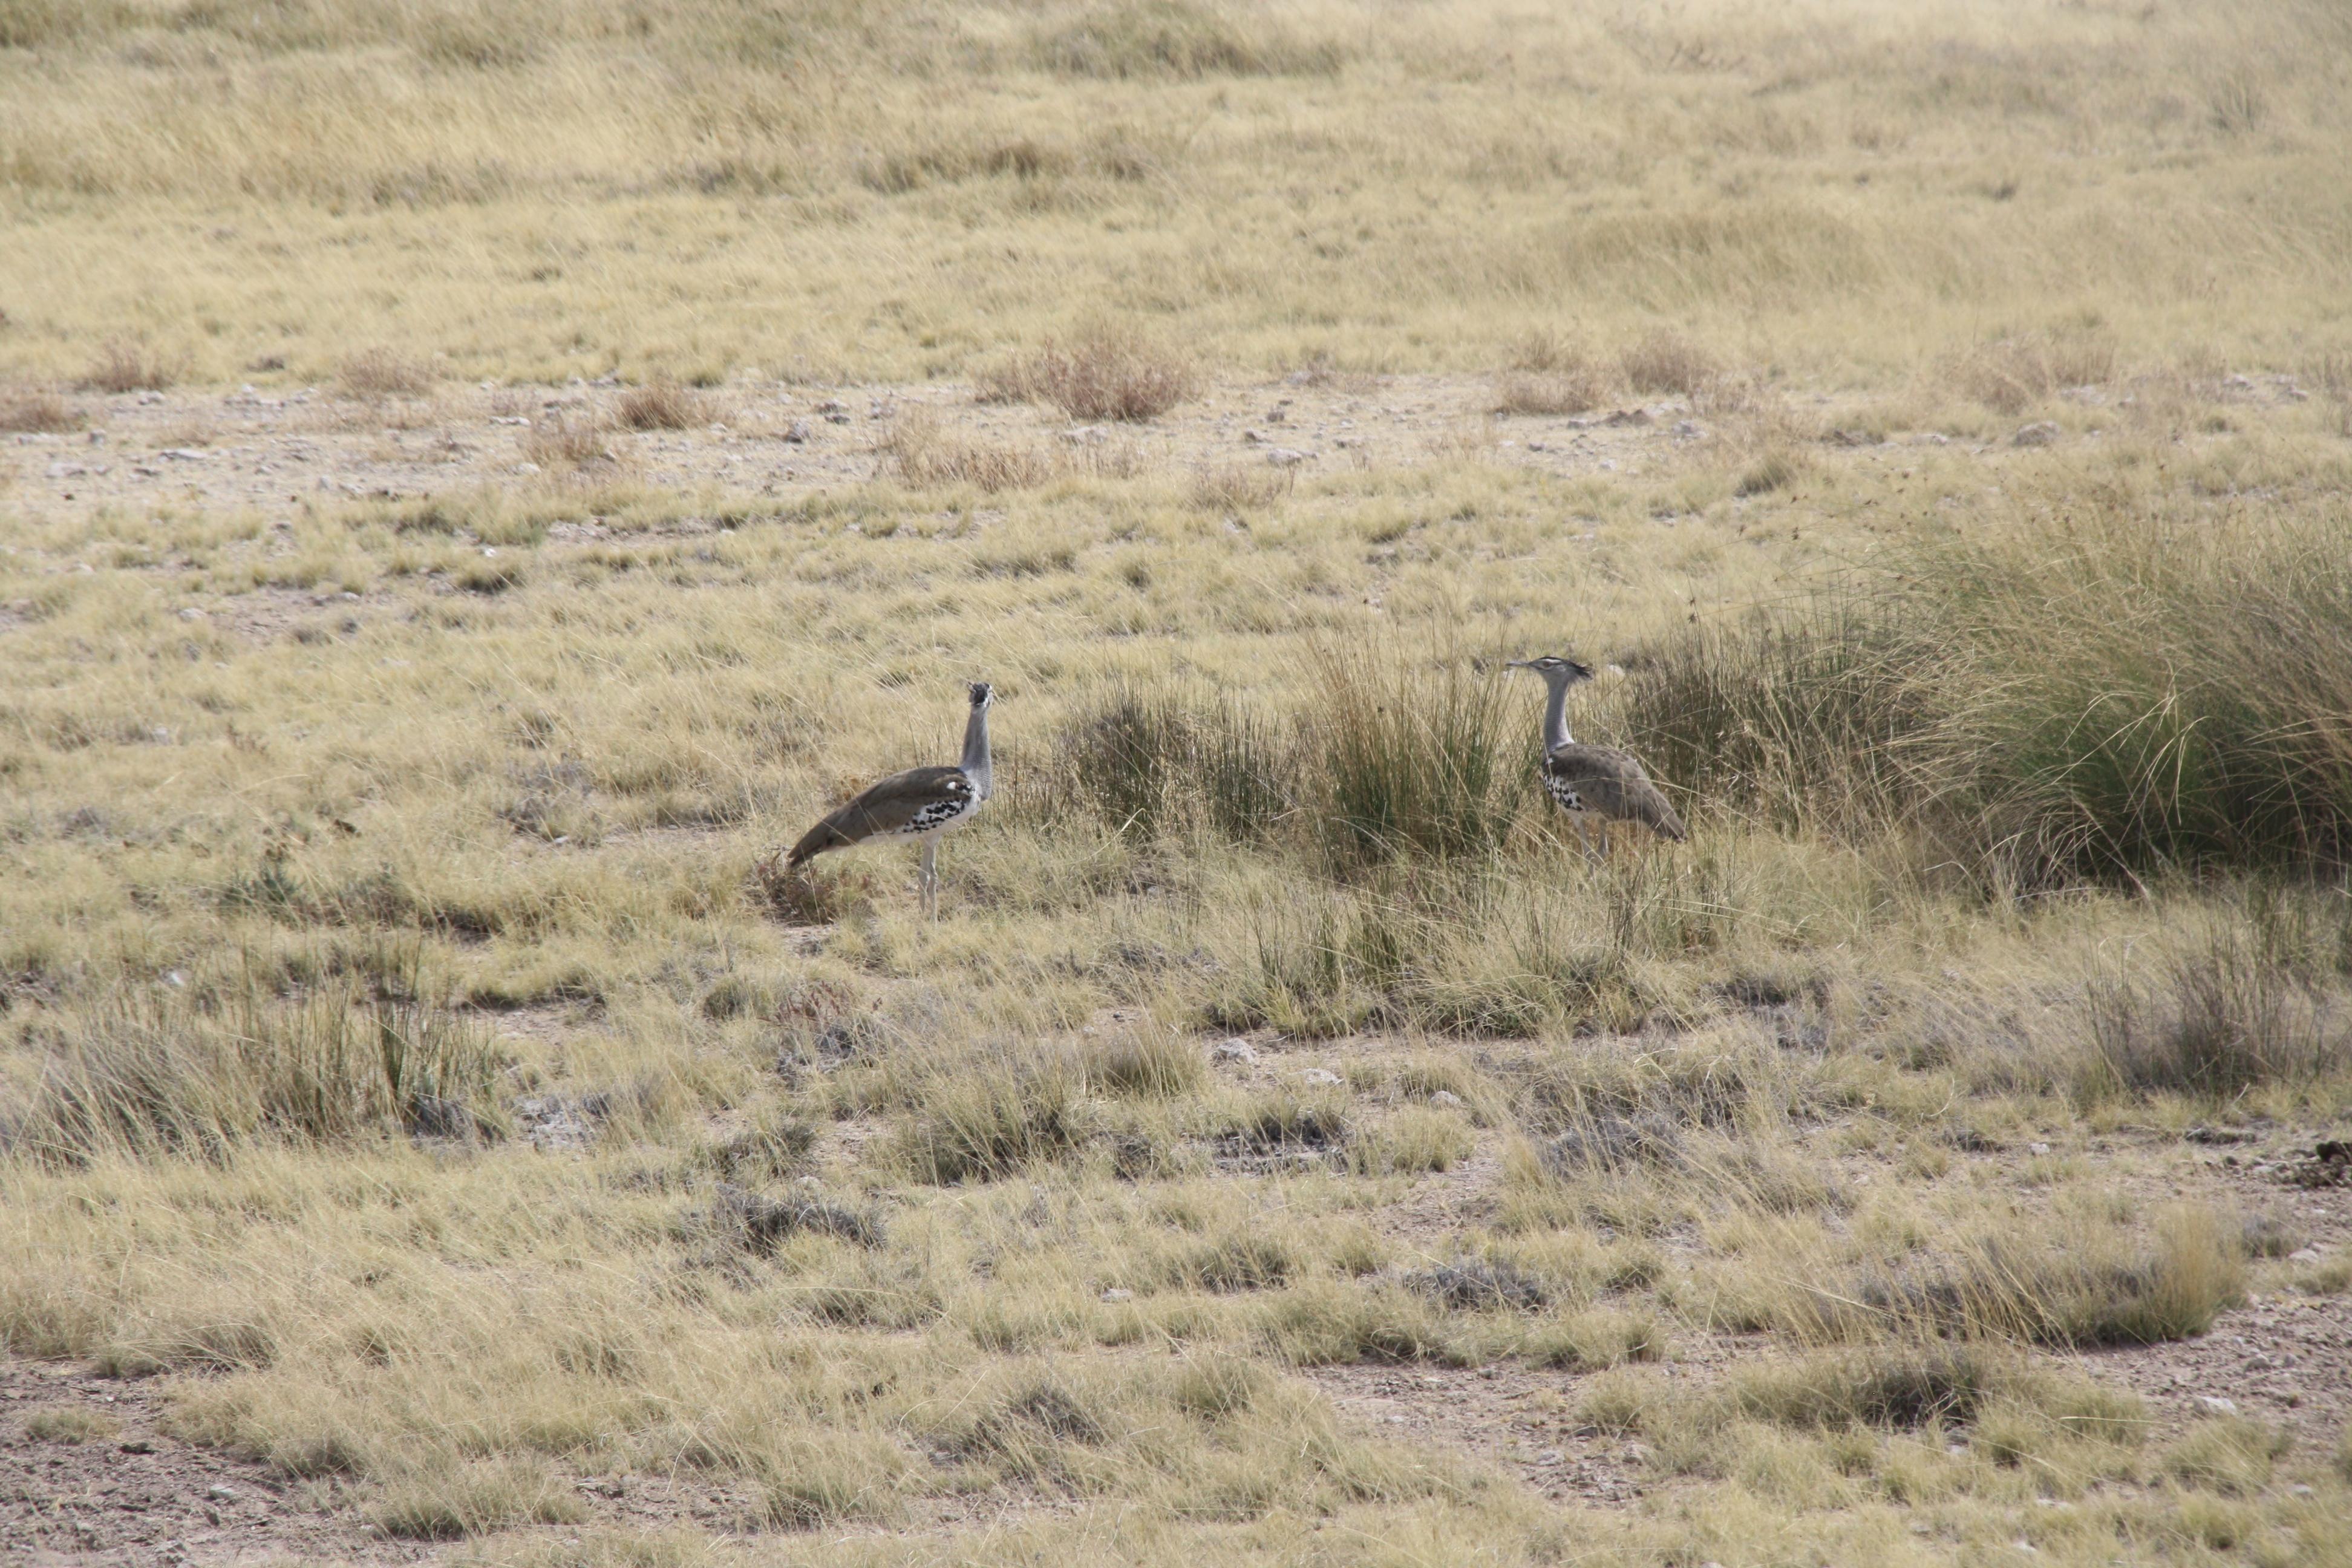 Kori Bustard Etosha Nationalpark Namibia